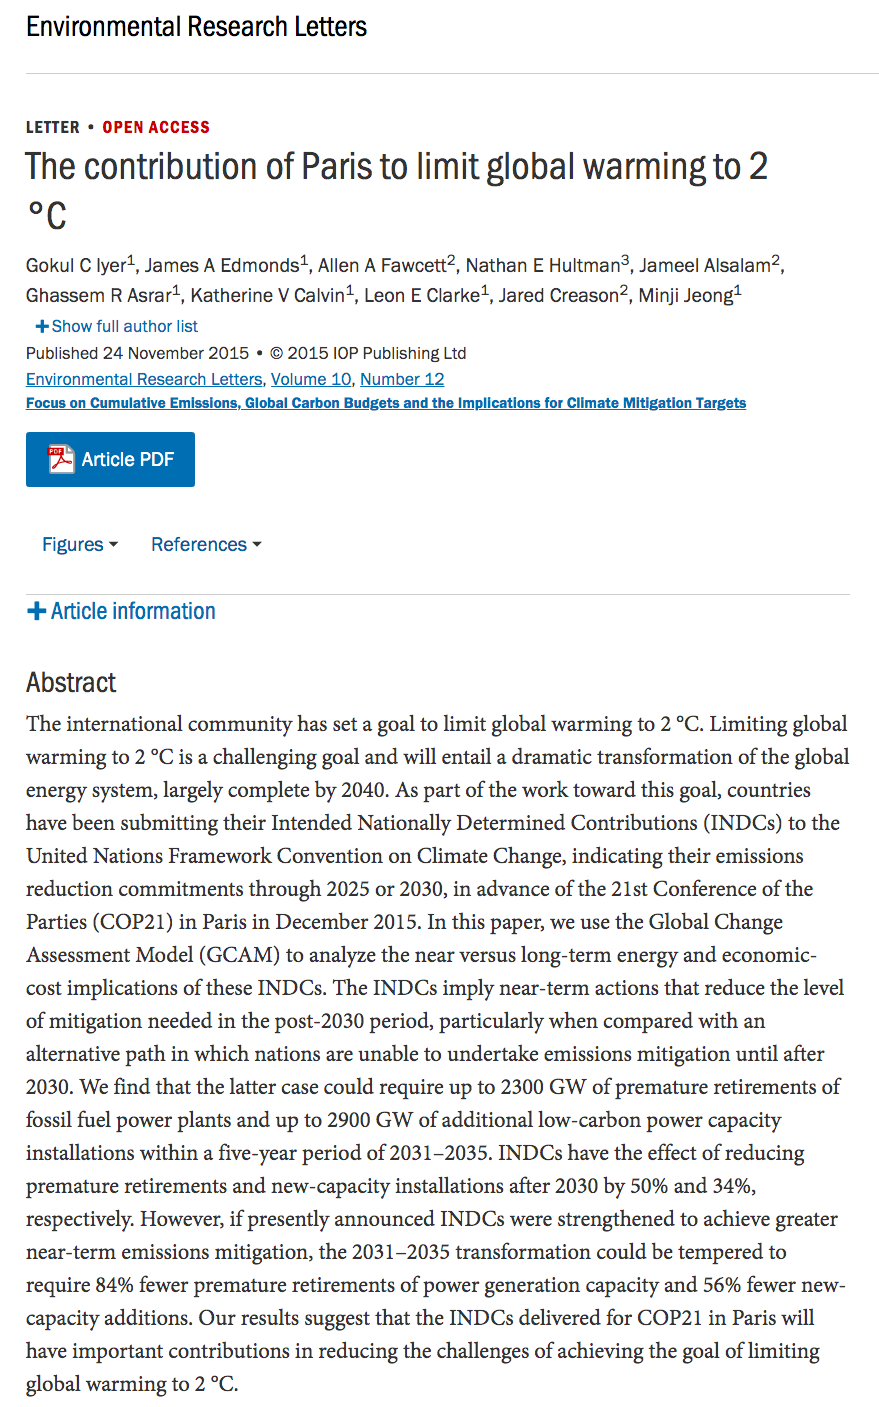 Iyer G C Edmonds J A Clarke L E Asrar G R Hultman N E Jeong M Et Al 2015 The Contribution Of Paris To Limit Global Warming To 2 C E Lettura